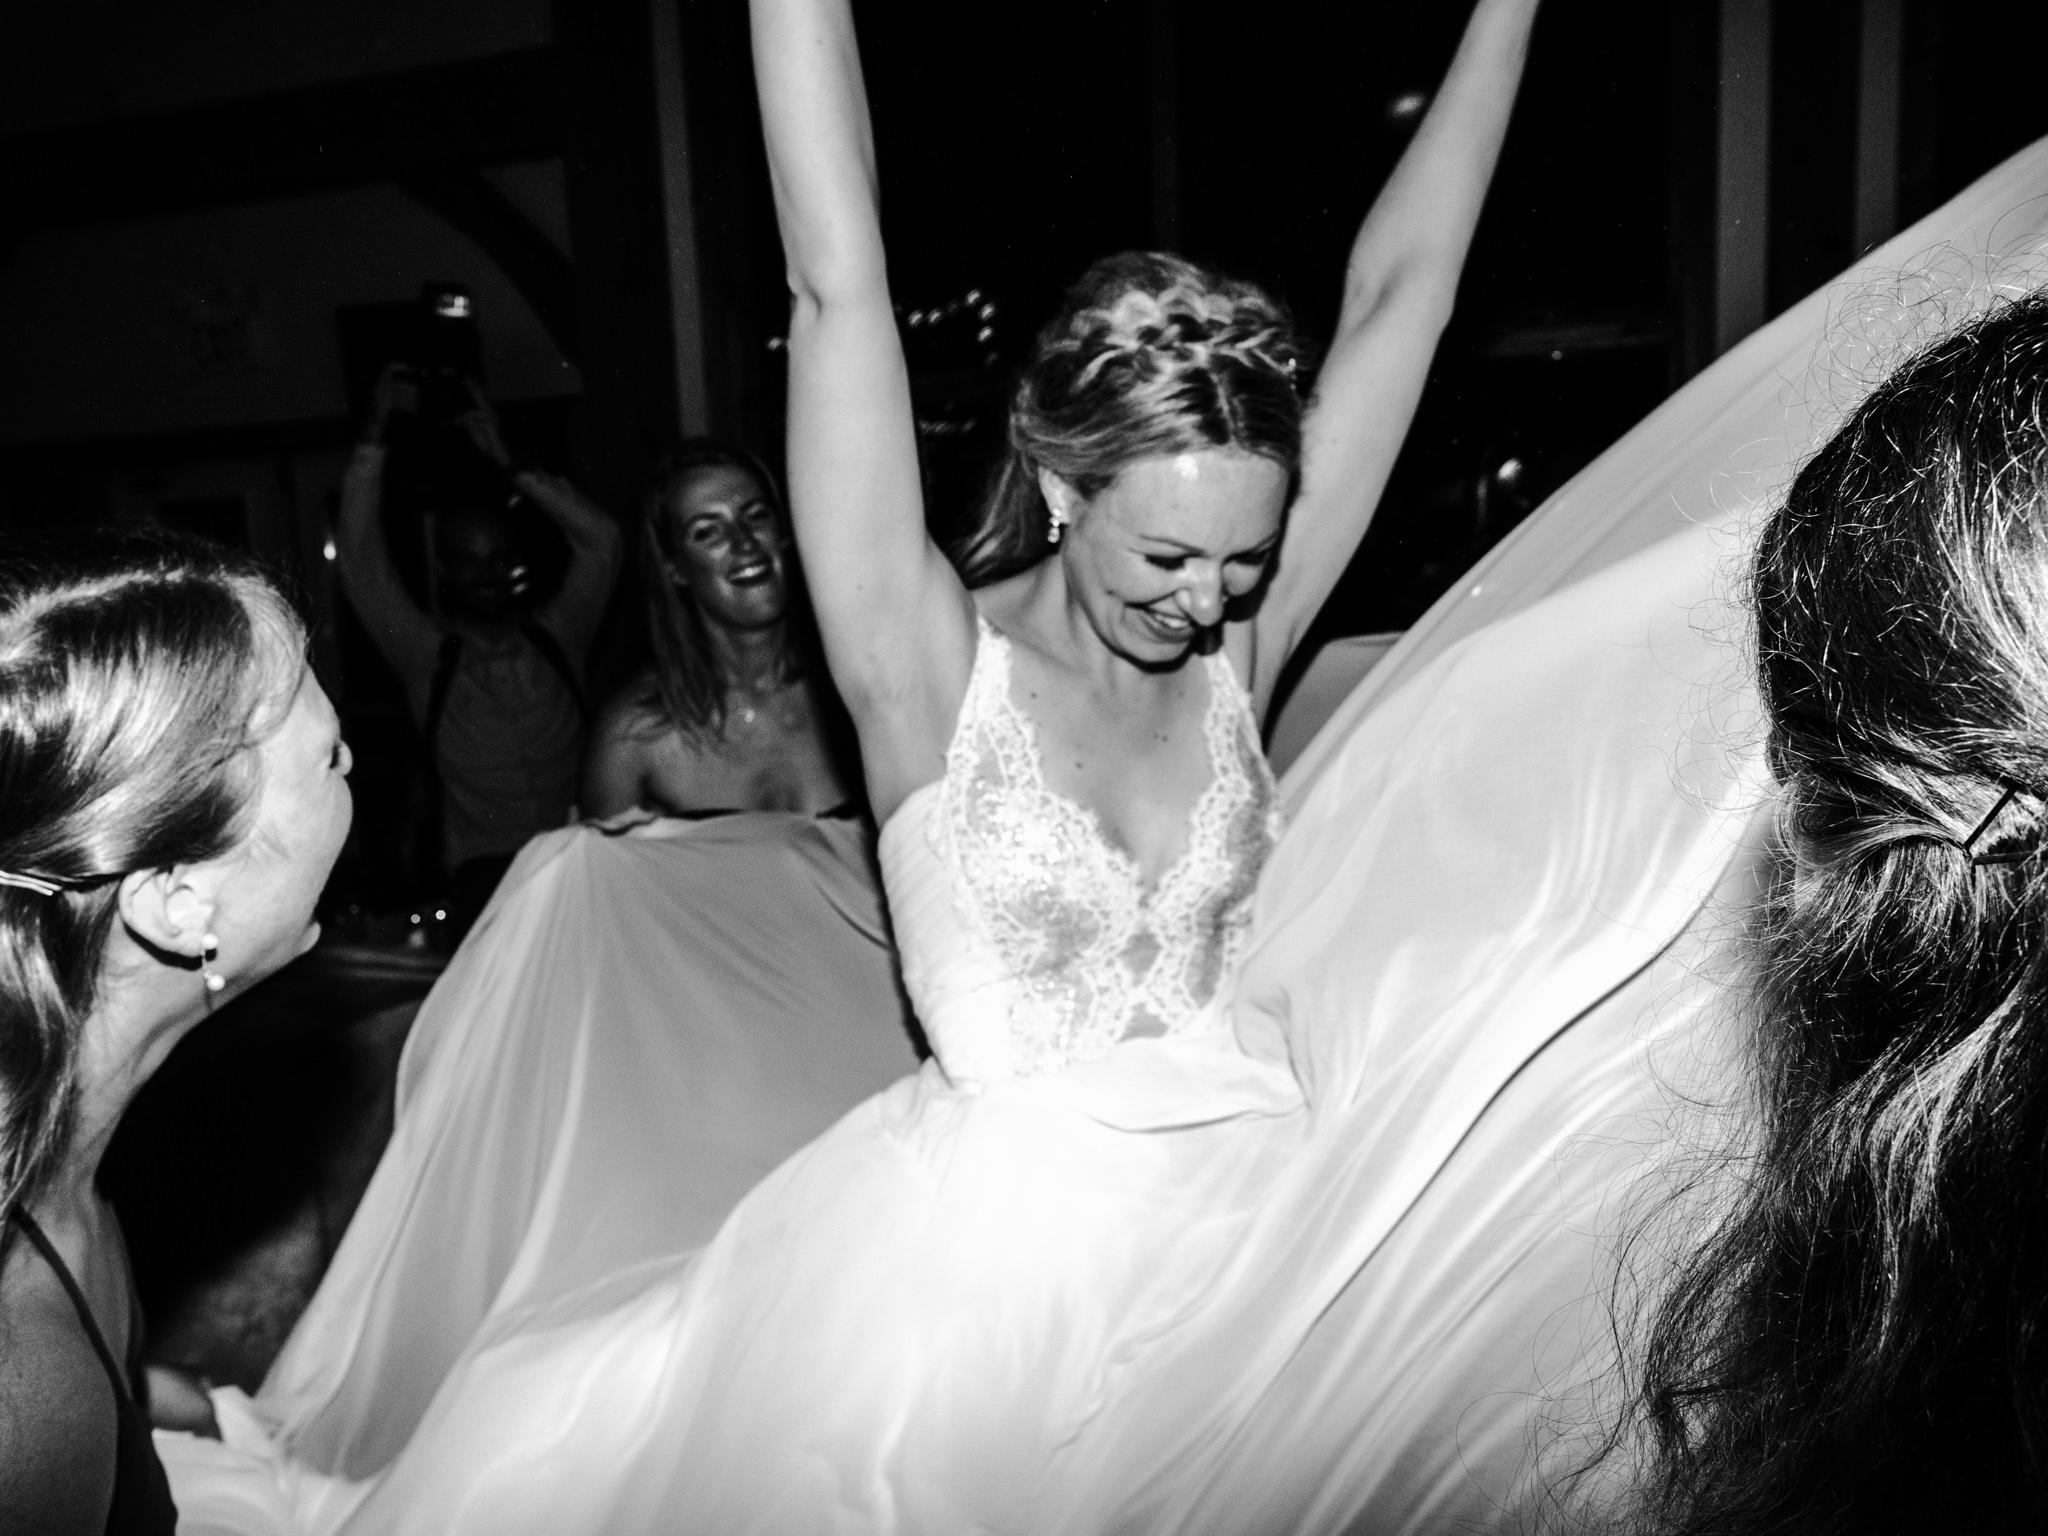 skyloft-wedding-toronto-wedding-photographer-71.jpg